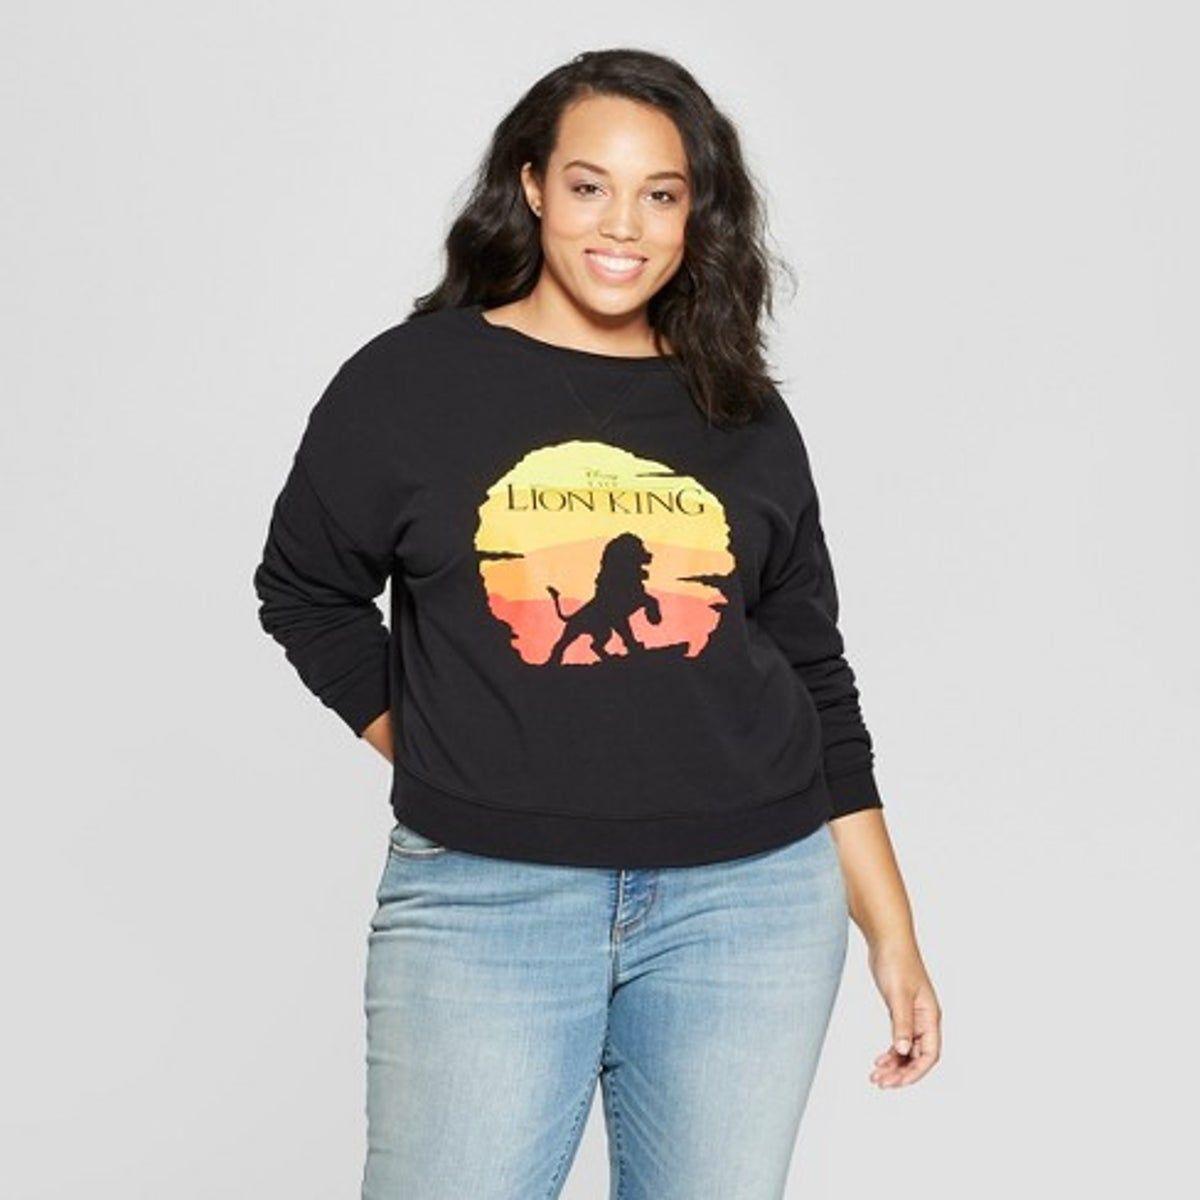 Disney The Lion King Black Sweatshirt Xl In 2021 Graphic Sweatshirt Plus Size Disney Outfits Plus Size Disney [ 1200 x 1200 Pixel ]